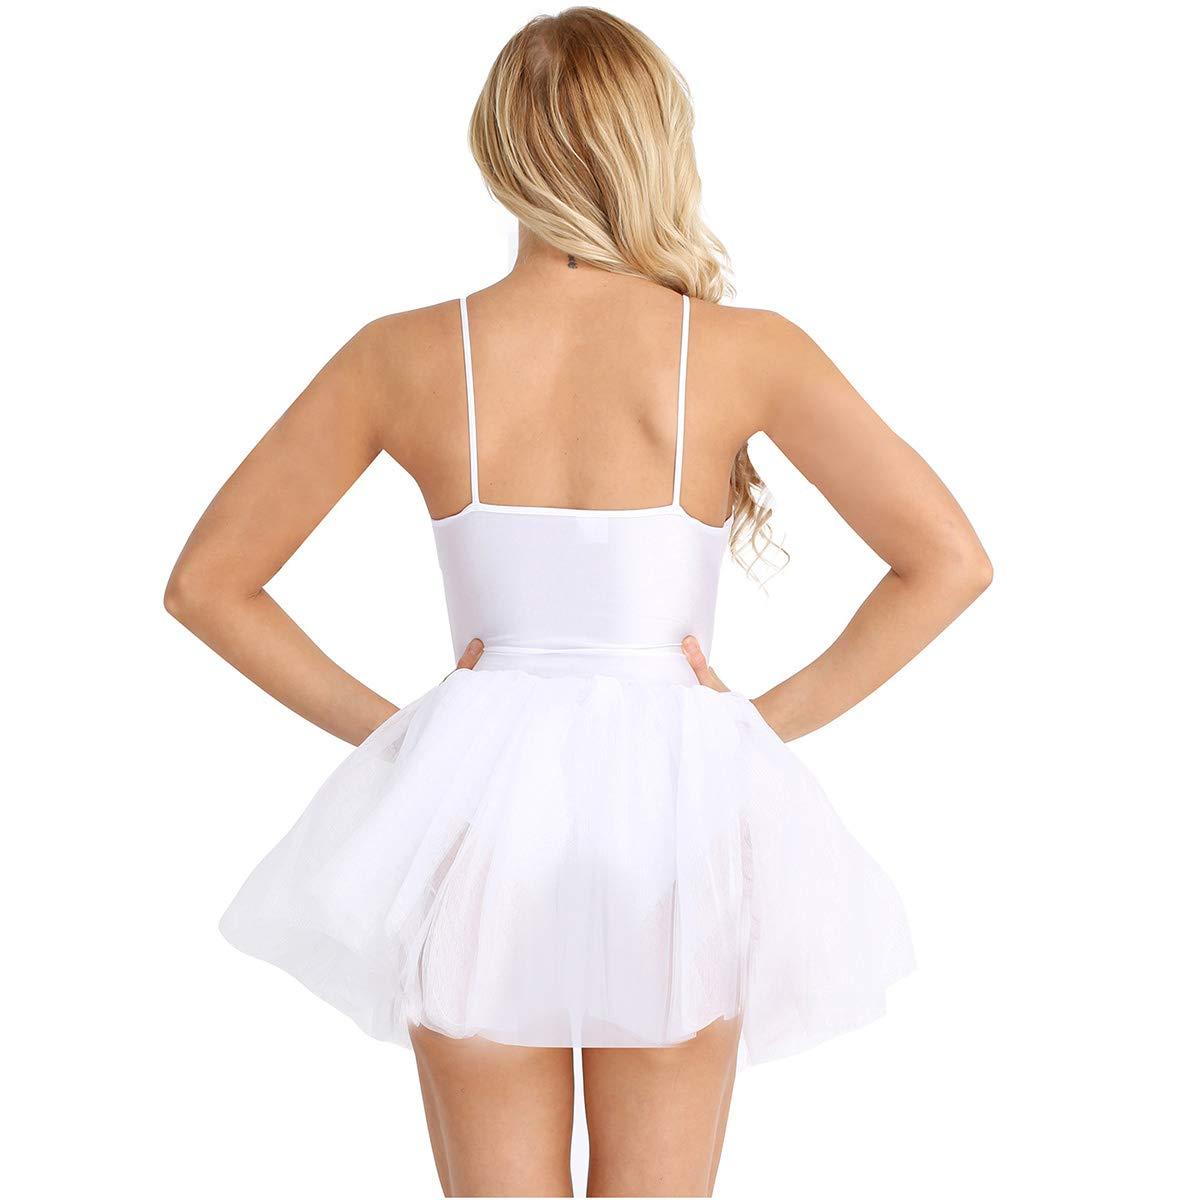 Freebily Vestido para Danza Ballet Mujer Disfraz de Princesa Lago de Cisnes Tutú Vestido Sin Mangas de Espaguetis Lentejuelas para Actuación de Baile ...